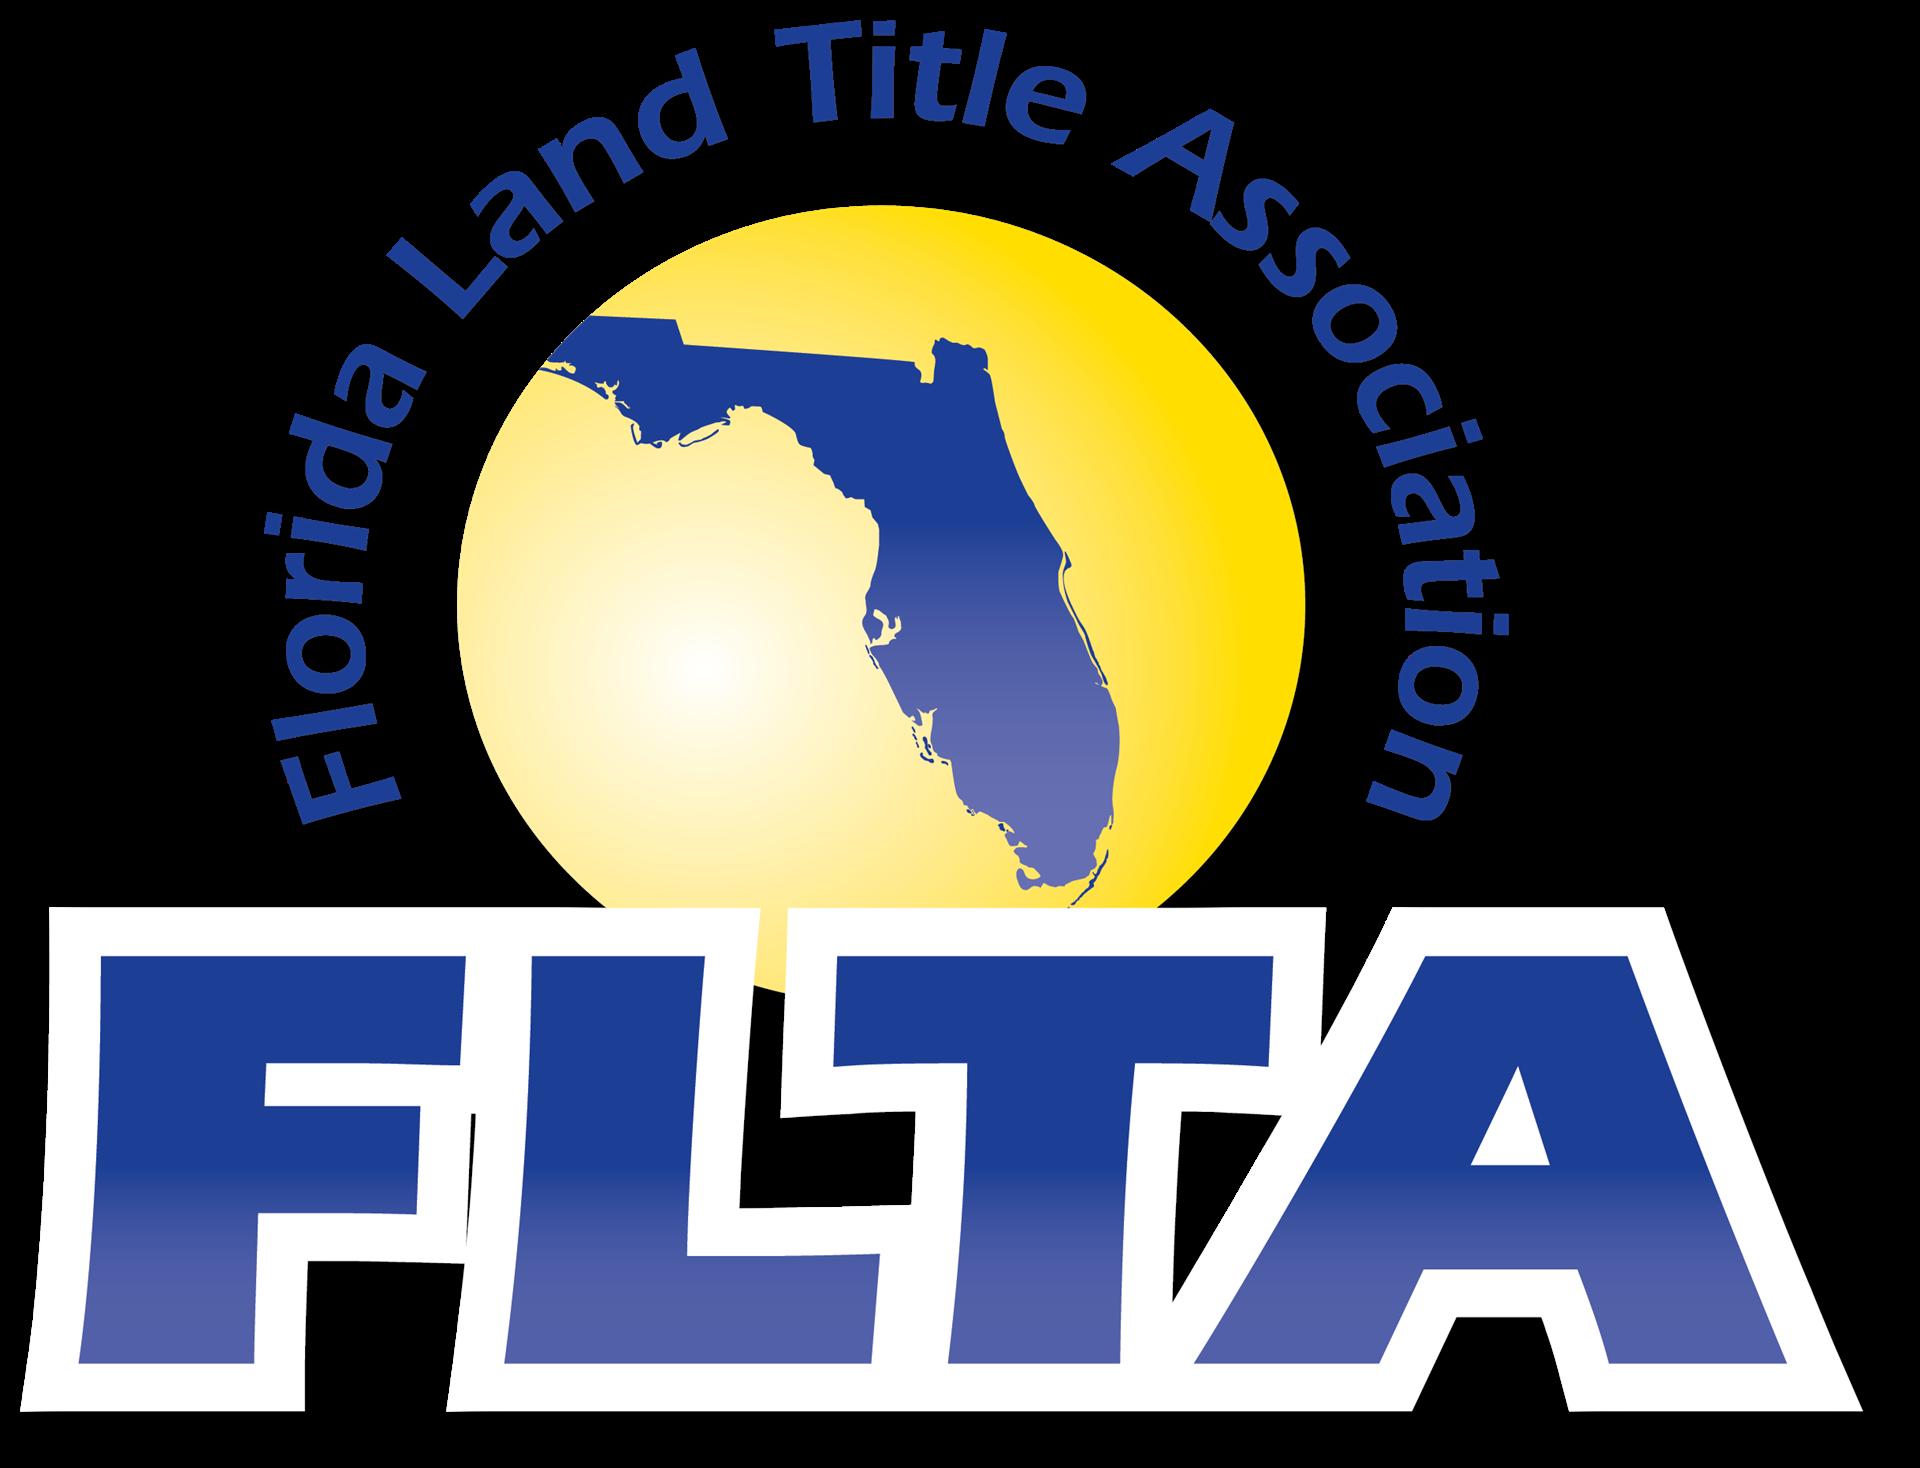 FLTA florida land title association Logo